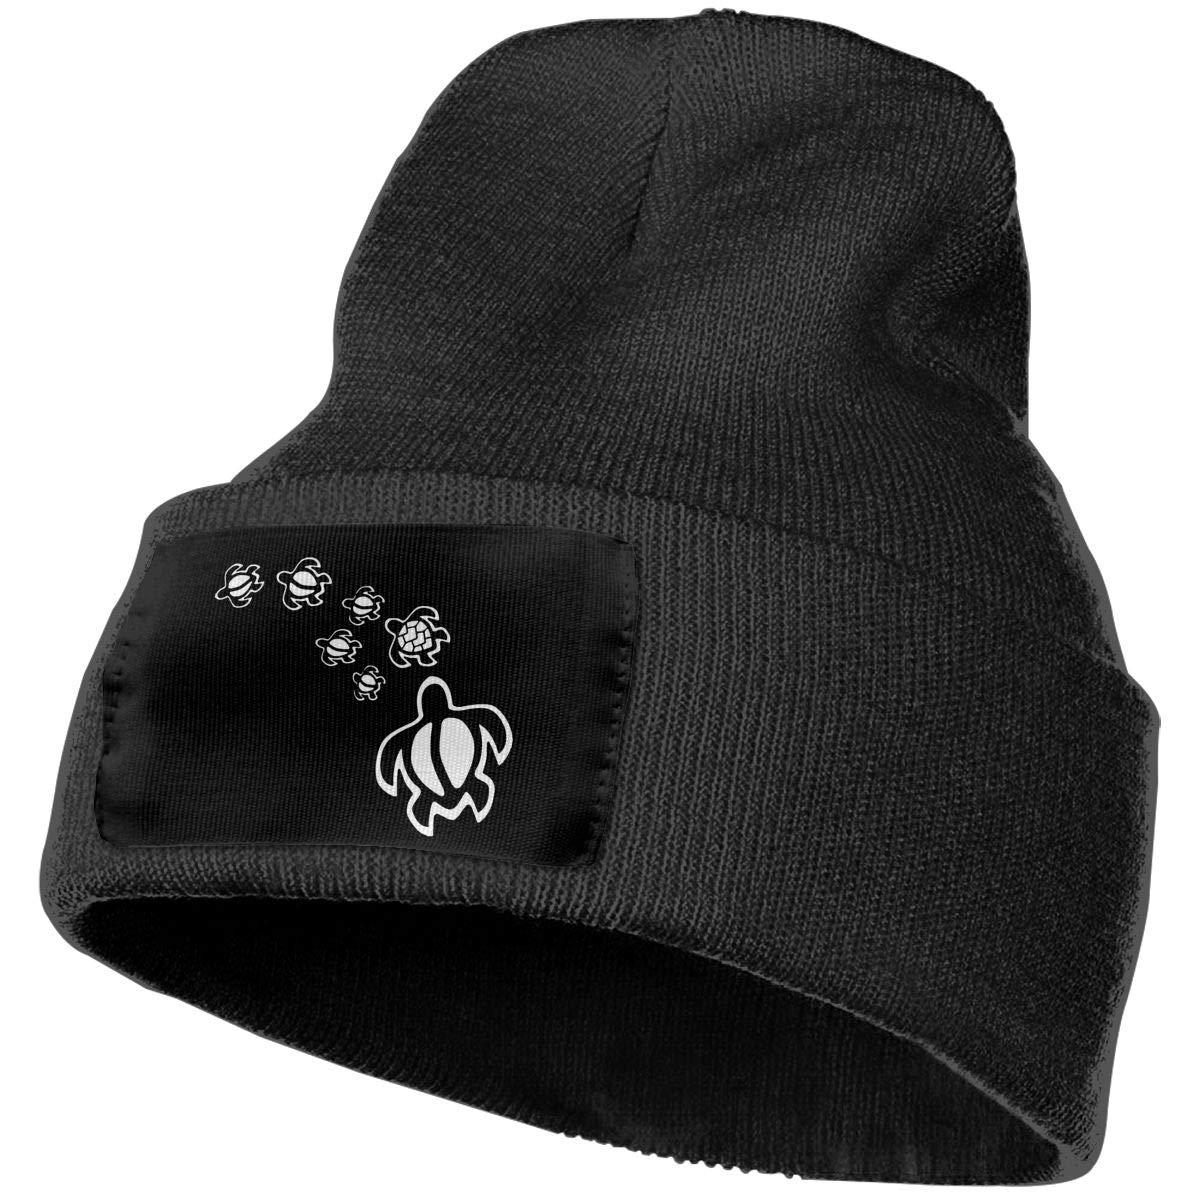 Turtle Hawaii Island Beanie Cap Hat Men Women Knit Hats Stretchy /& Soft Beanie